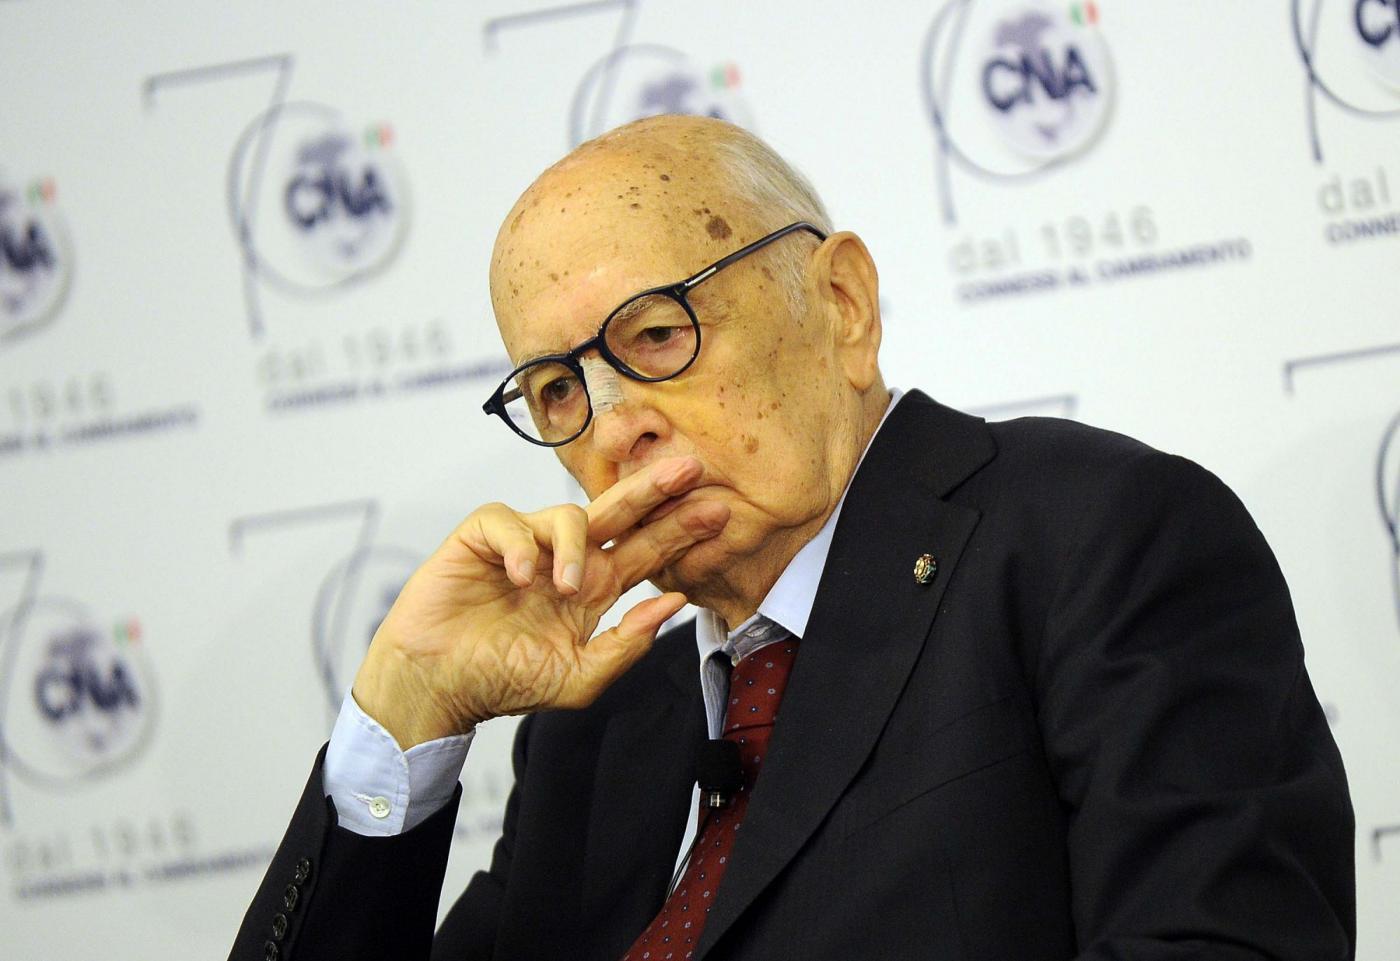 Napolitano su riforme referendum e italicum